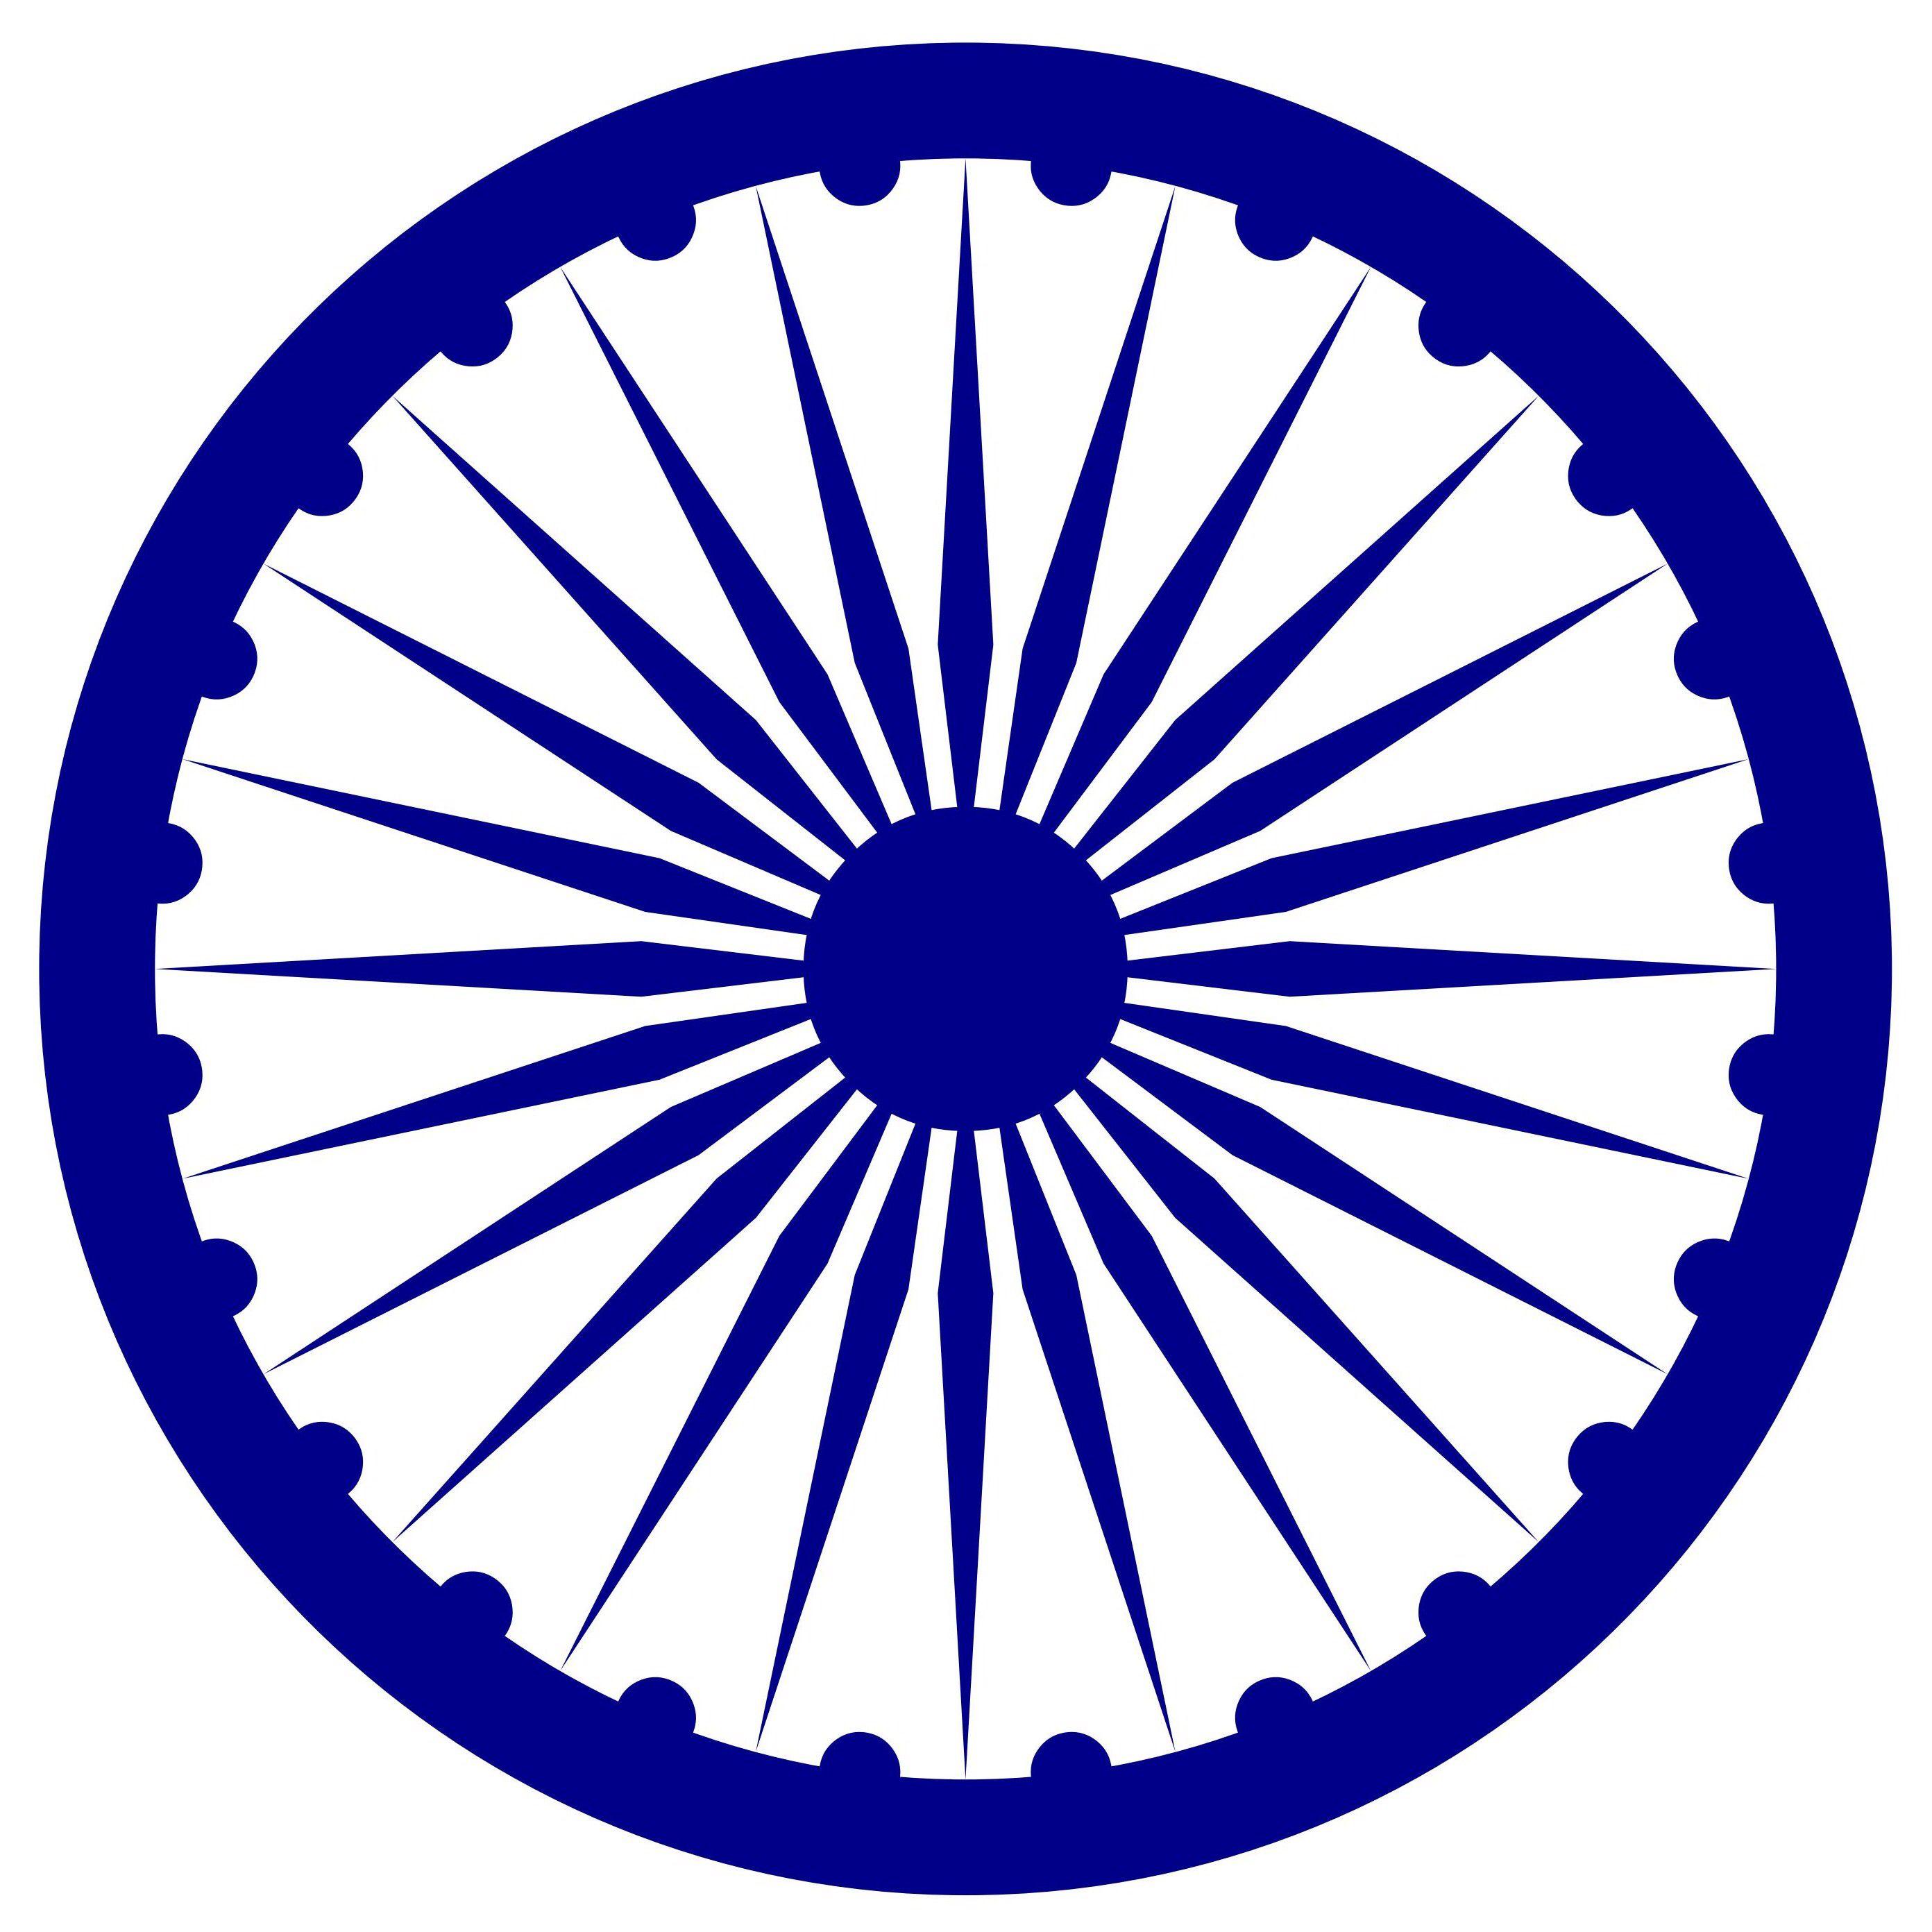 Indian flag chakra clipart jpg black and white Ashoka Chakra | Photography in 2019 | Ashoka chakra, Buddhist ... jpg black and white